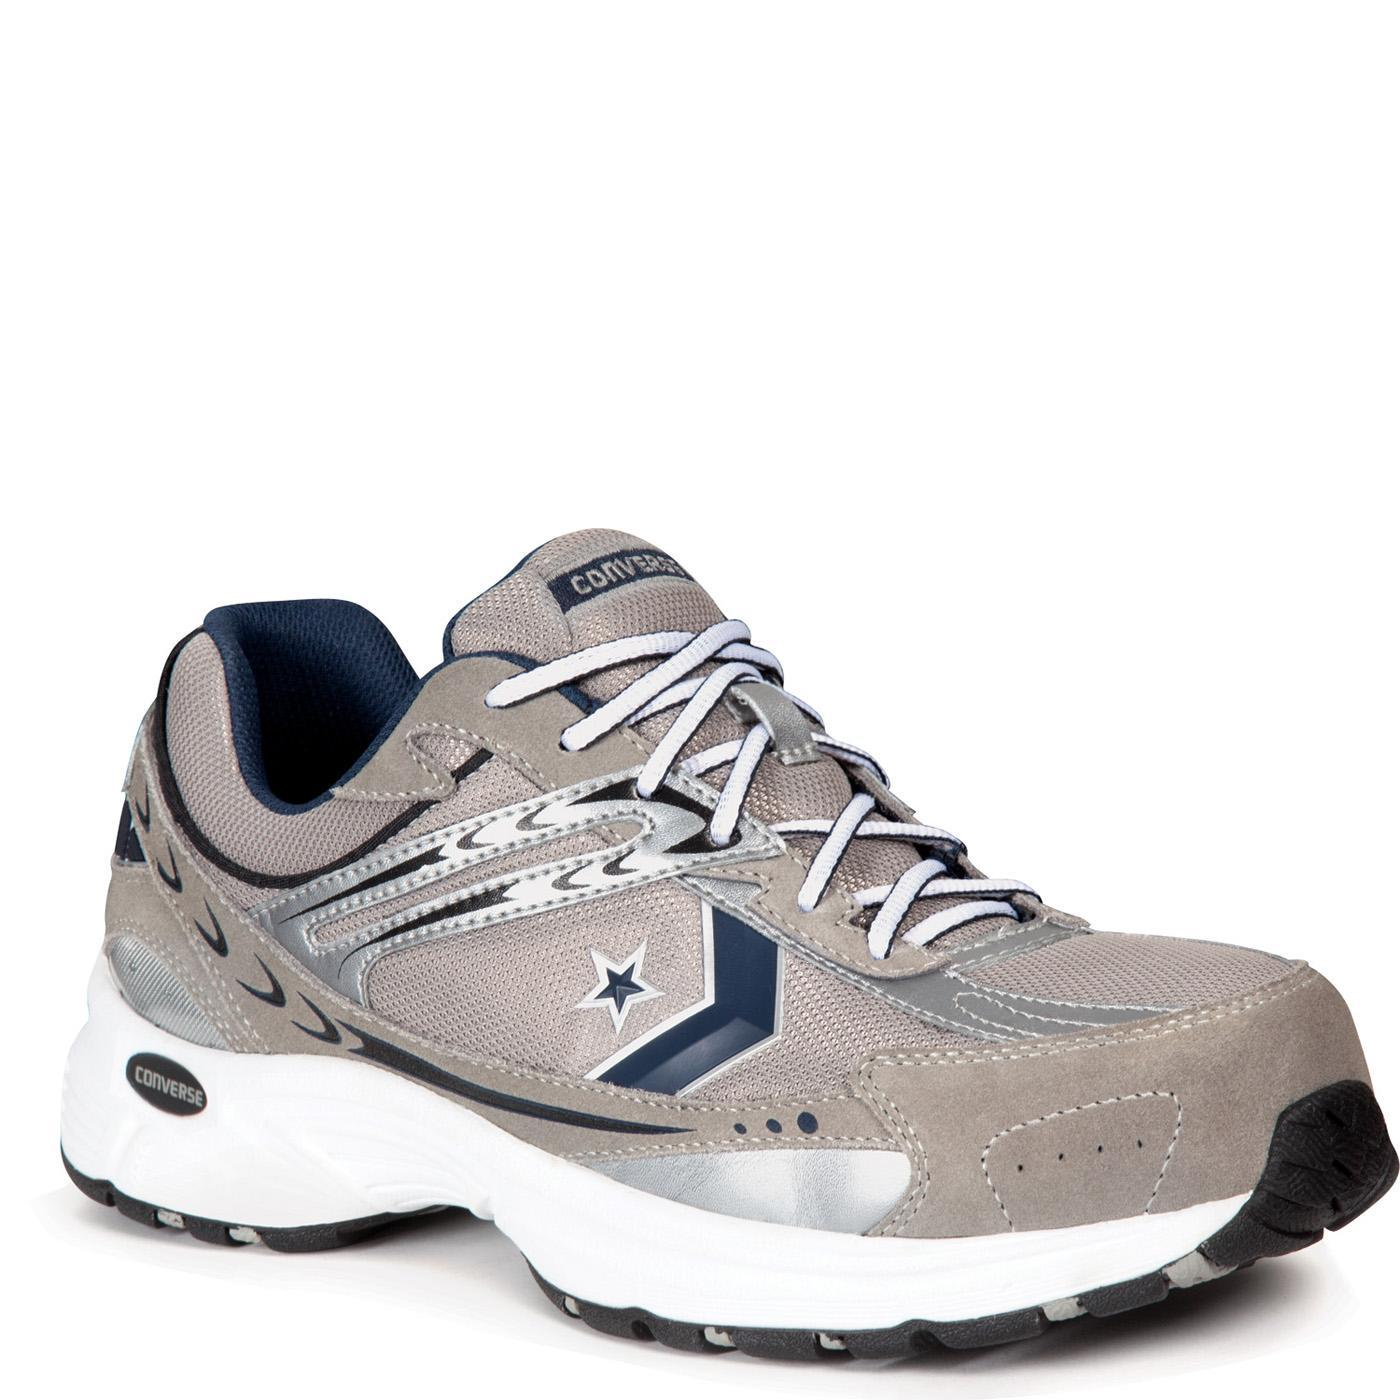 Converse Steel Toe Unisex Athletic Work Shoes